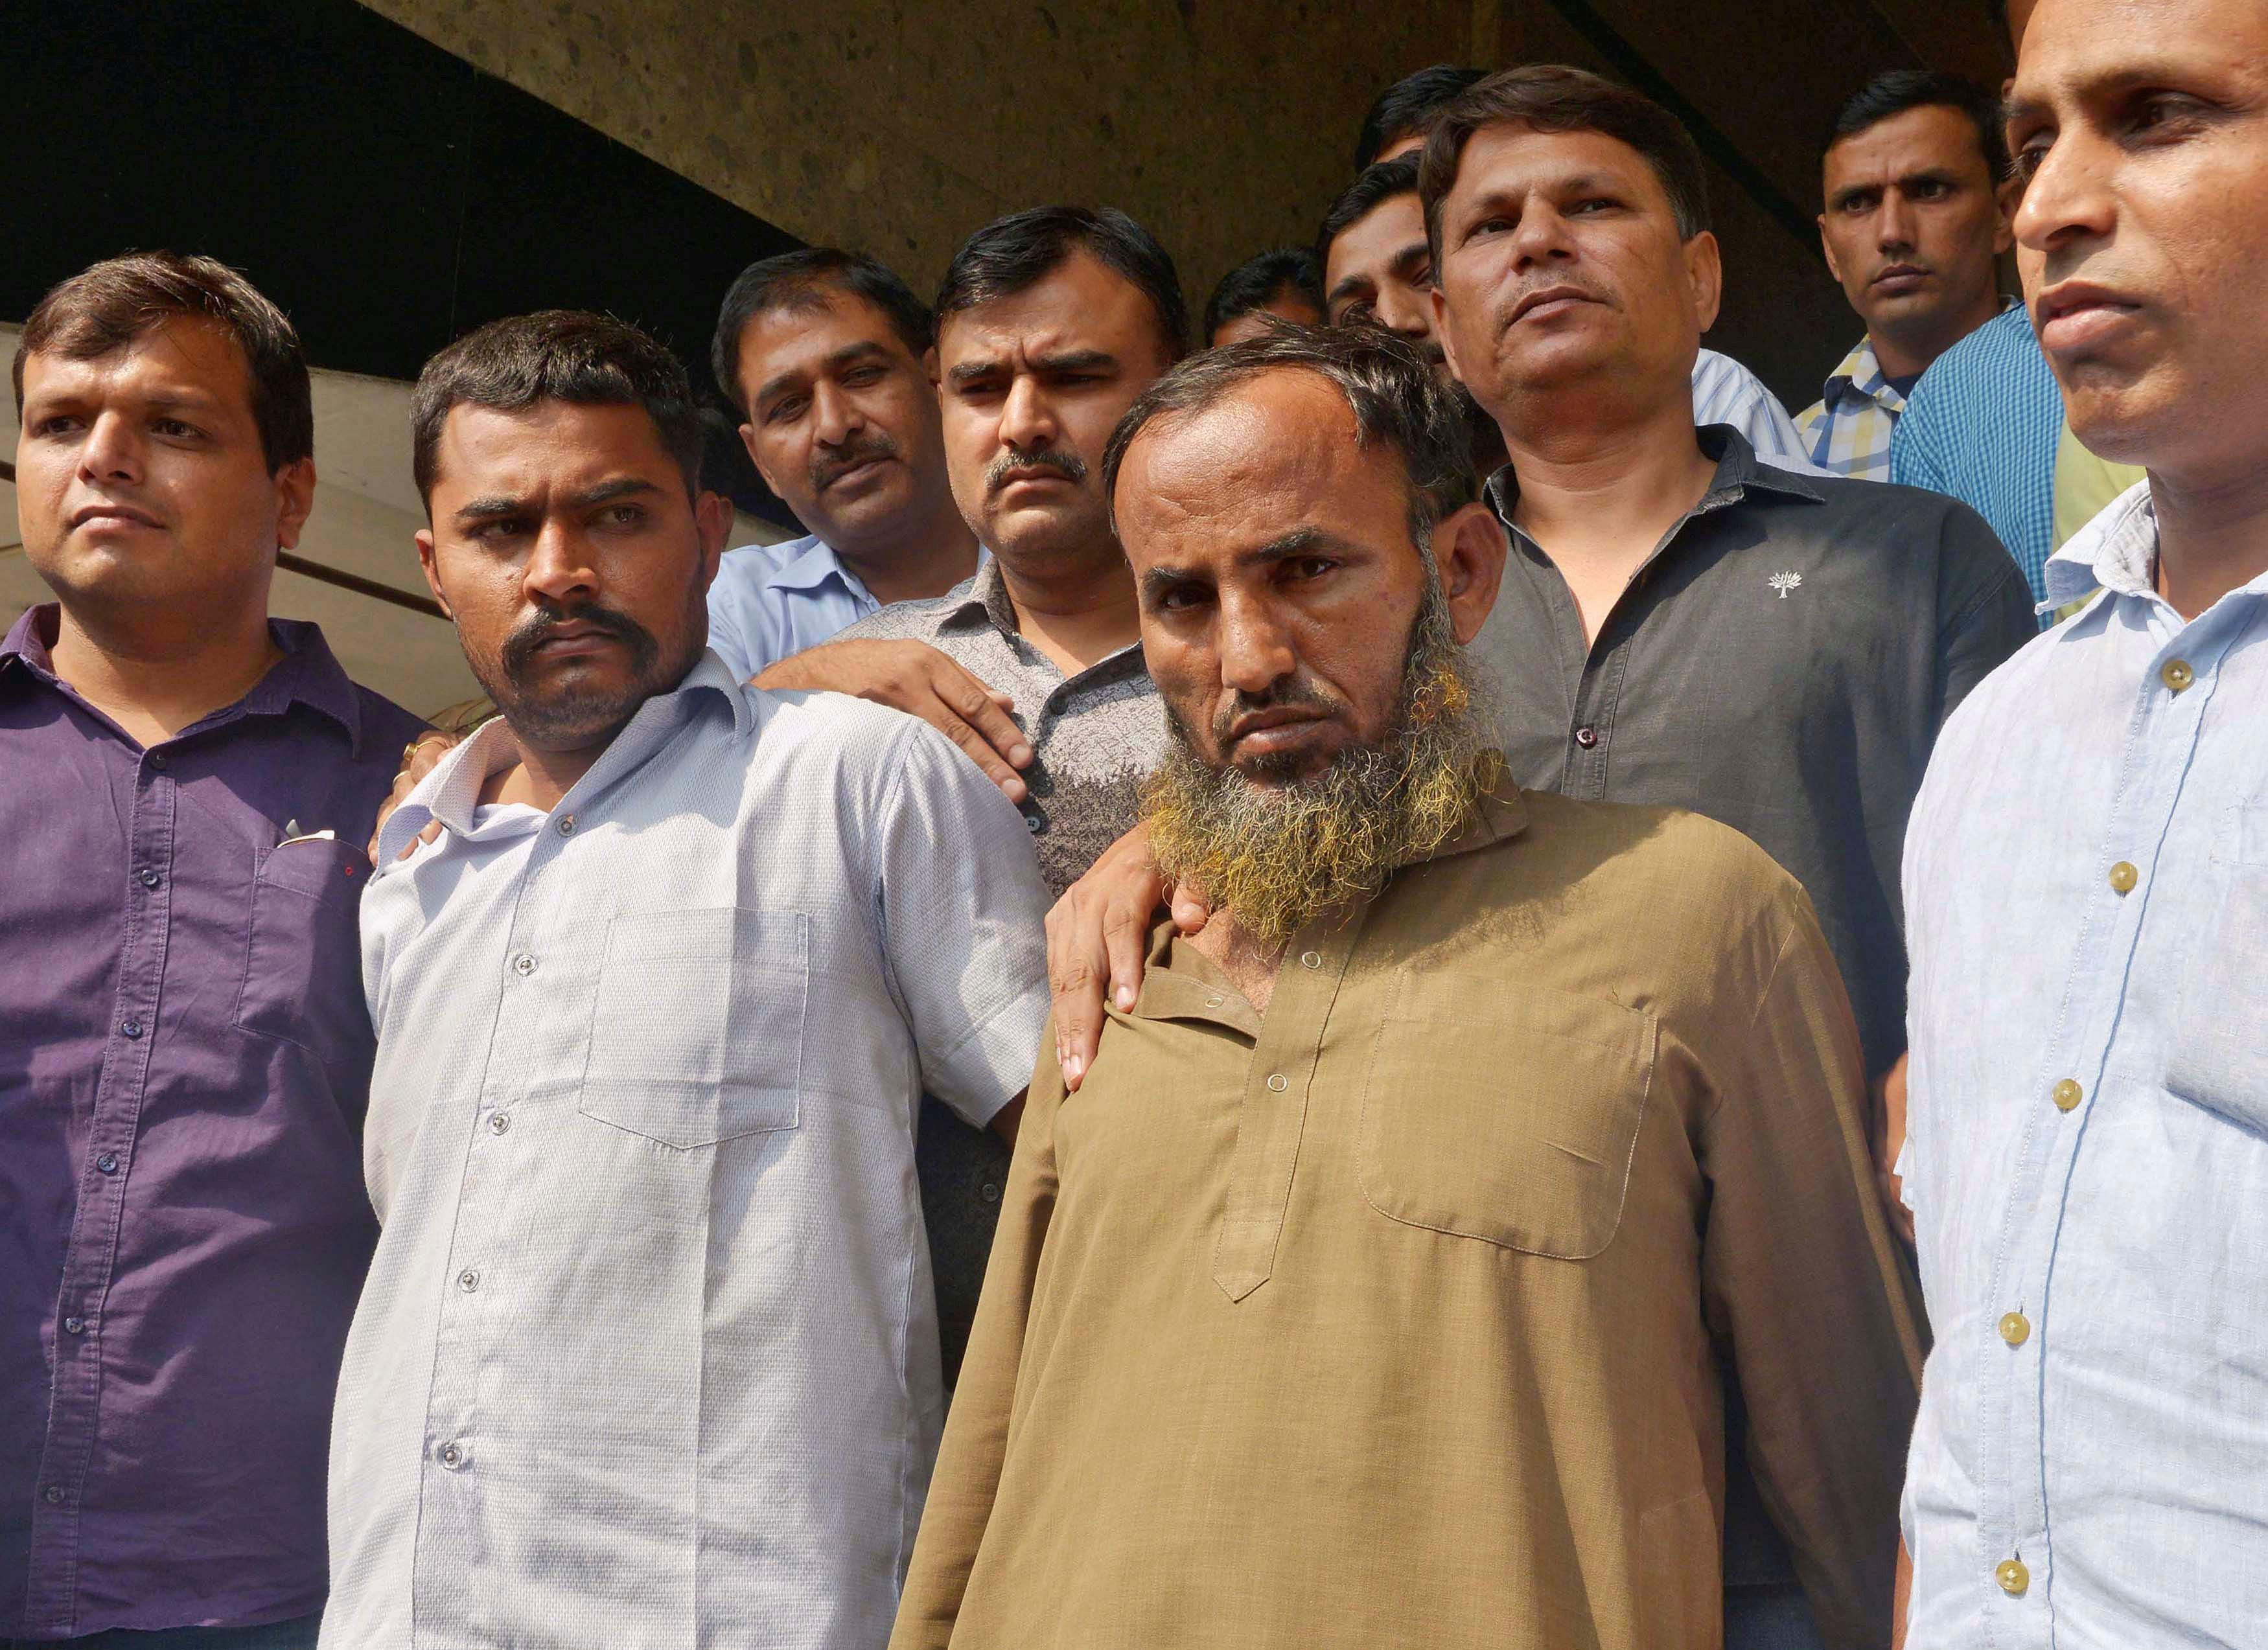 Aide to Samajwadi Party MP arrested in espionage case